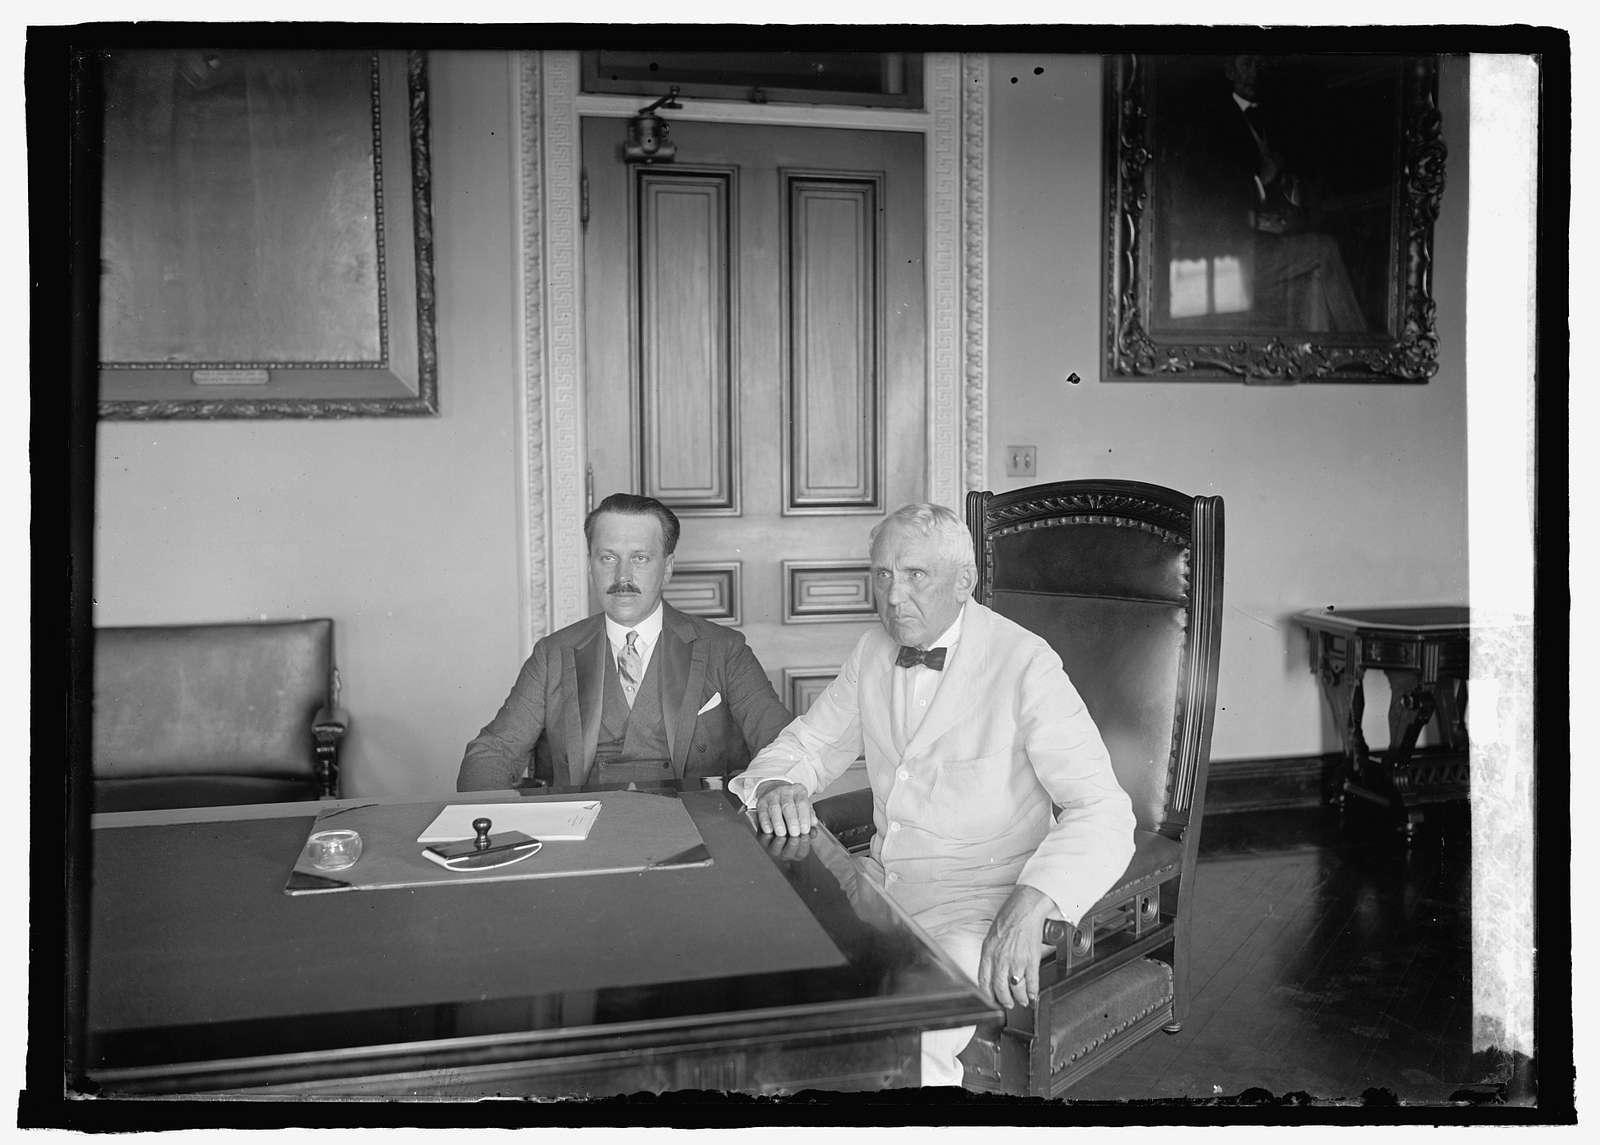 Count Alexander Skrzynski and Kellogg, 71725